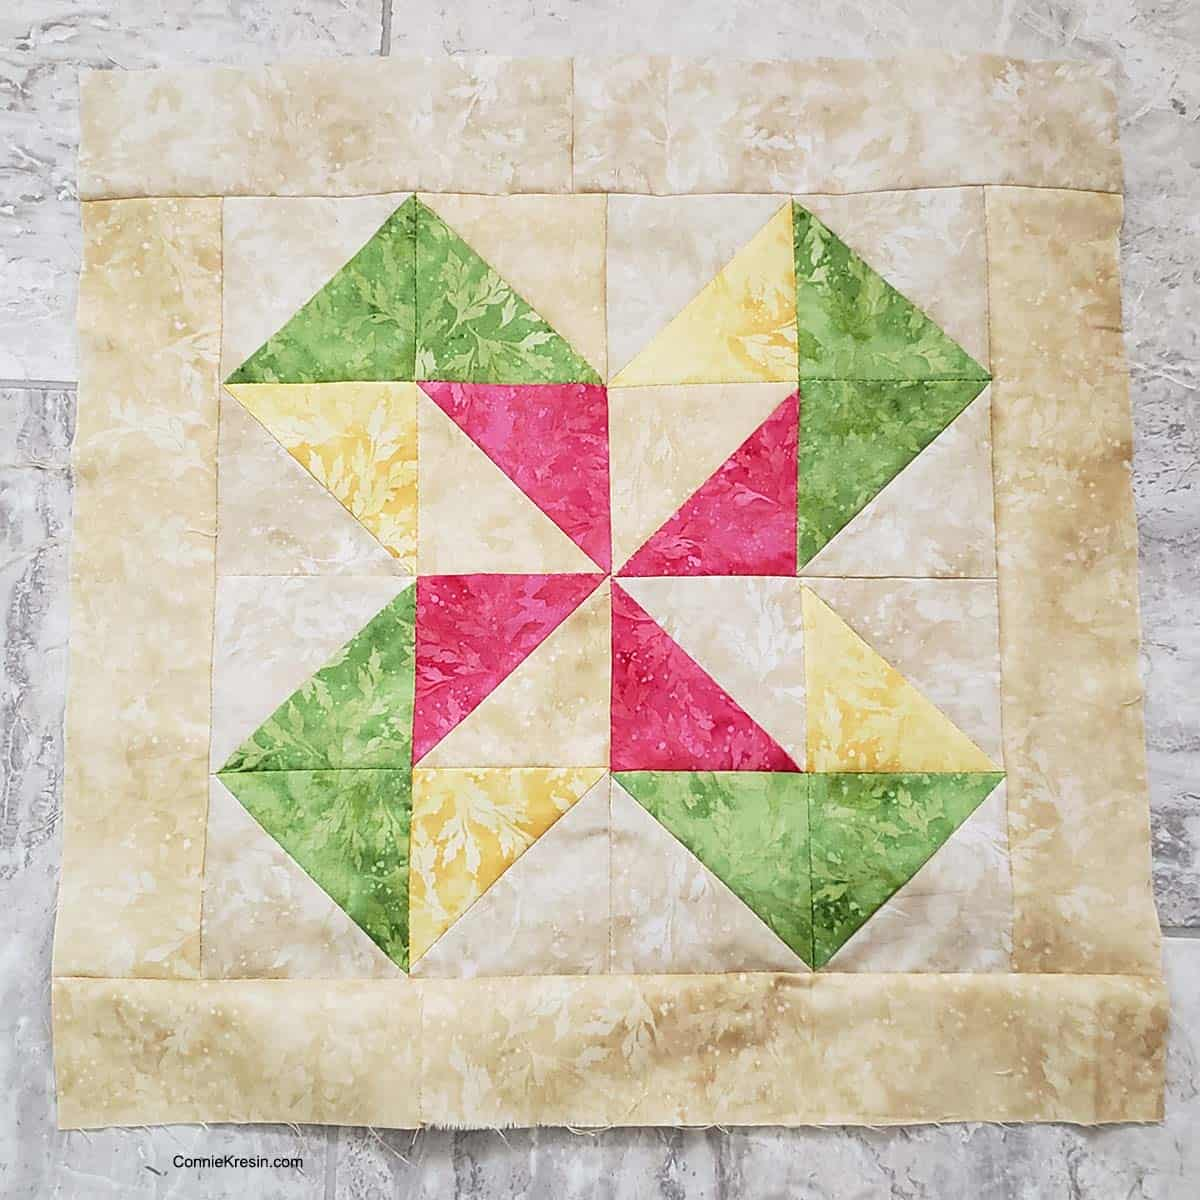 Pinwheel quilt block blending